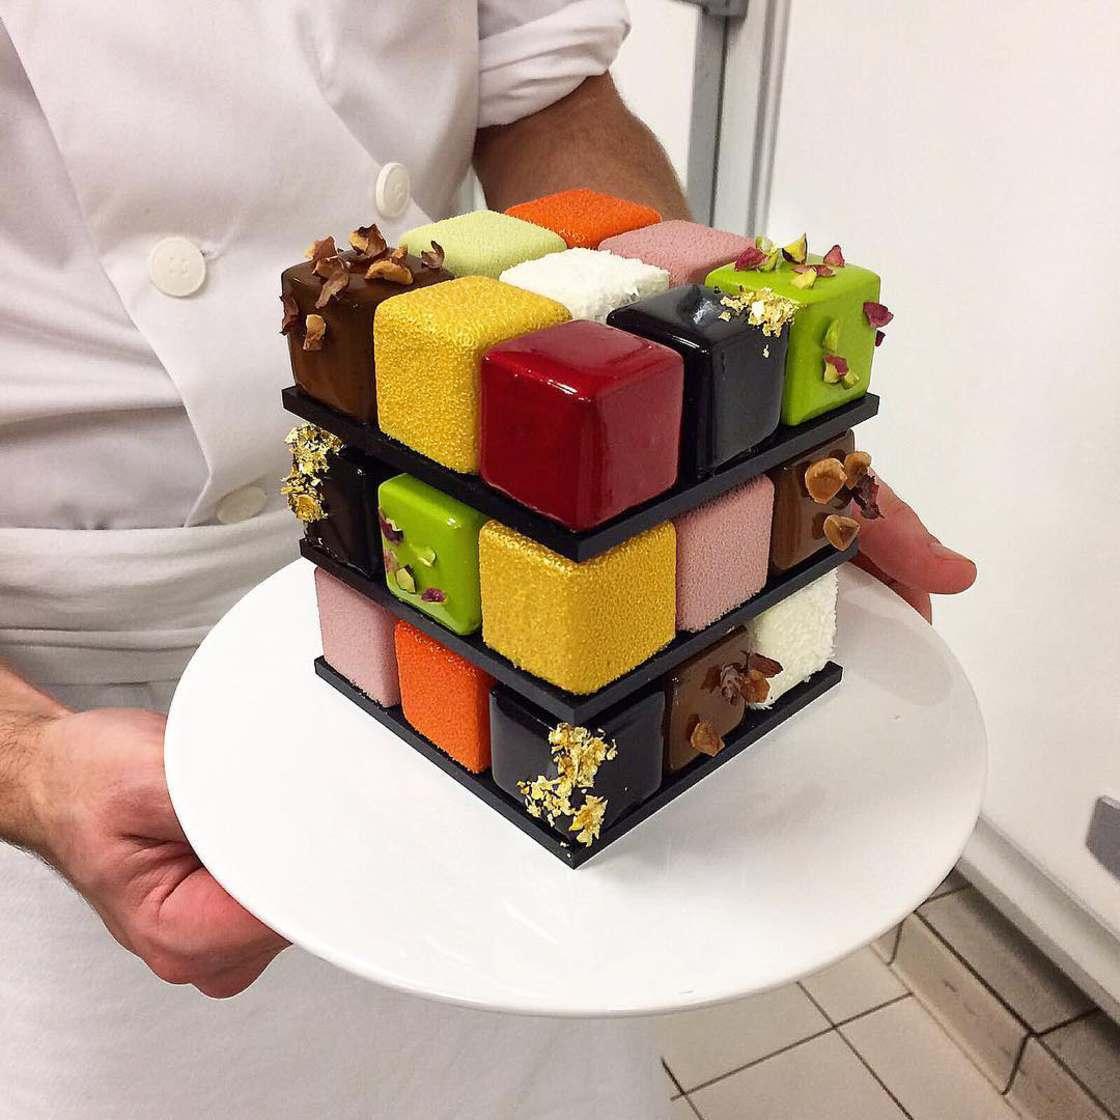 Rubik's Cake - Une appetissante patisserie geometrique !